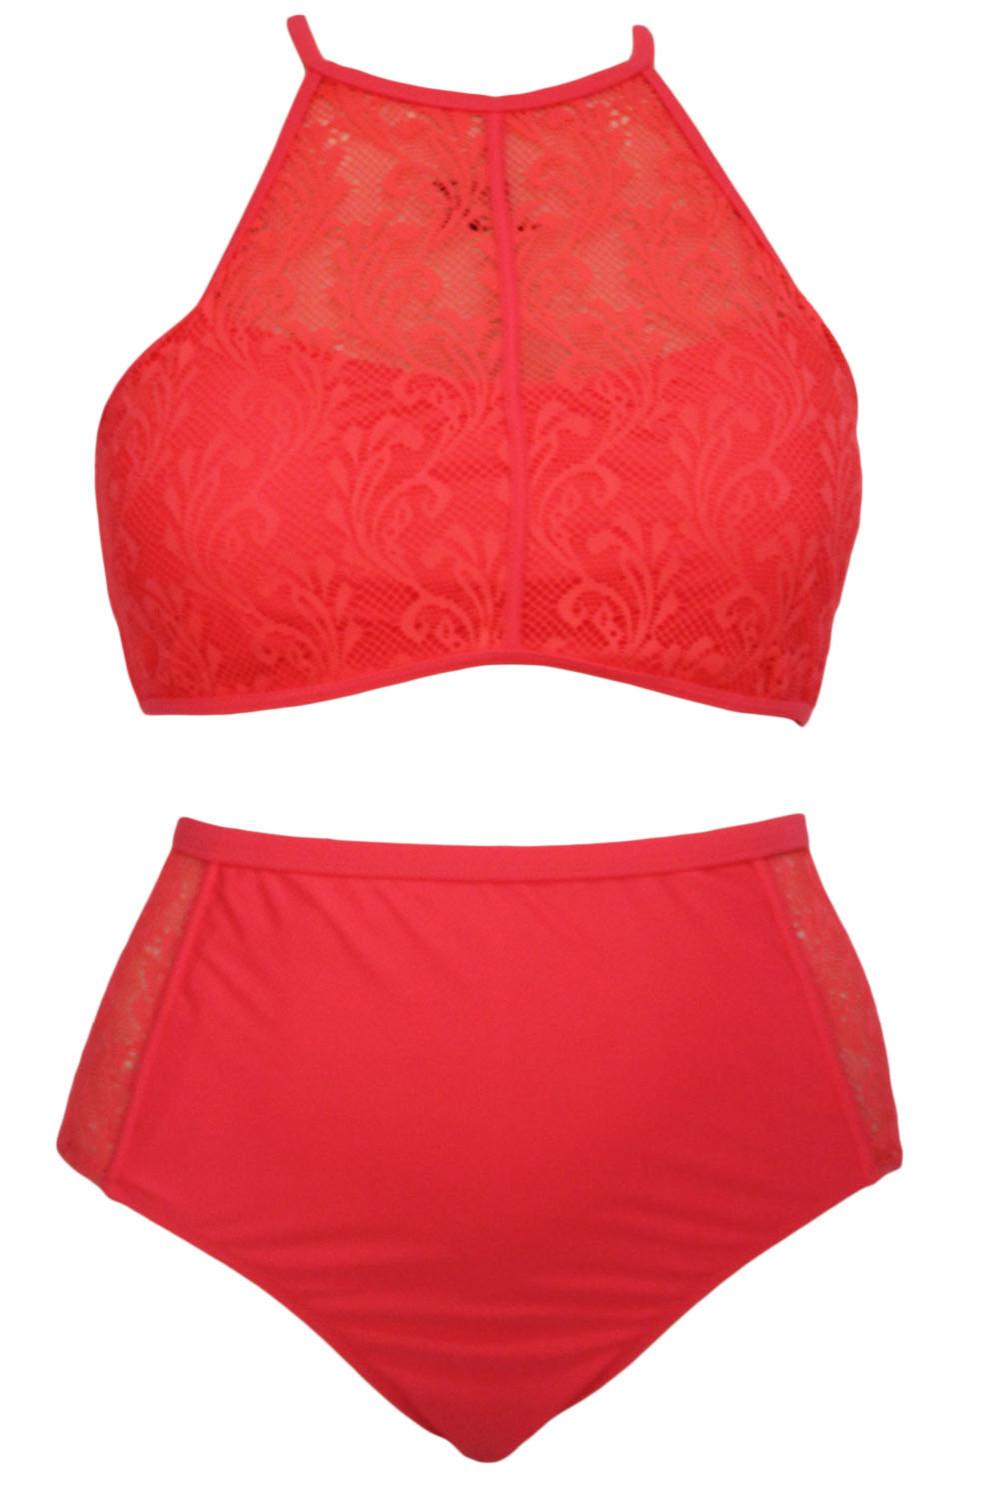 4813f3431d high neck padded swimsuit Plus Size High Waist Swimsuit Halter ...